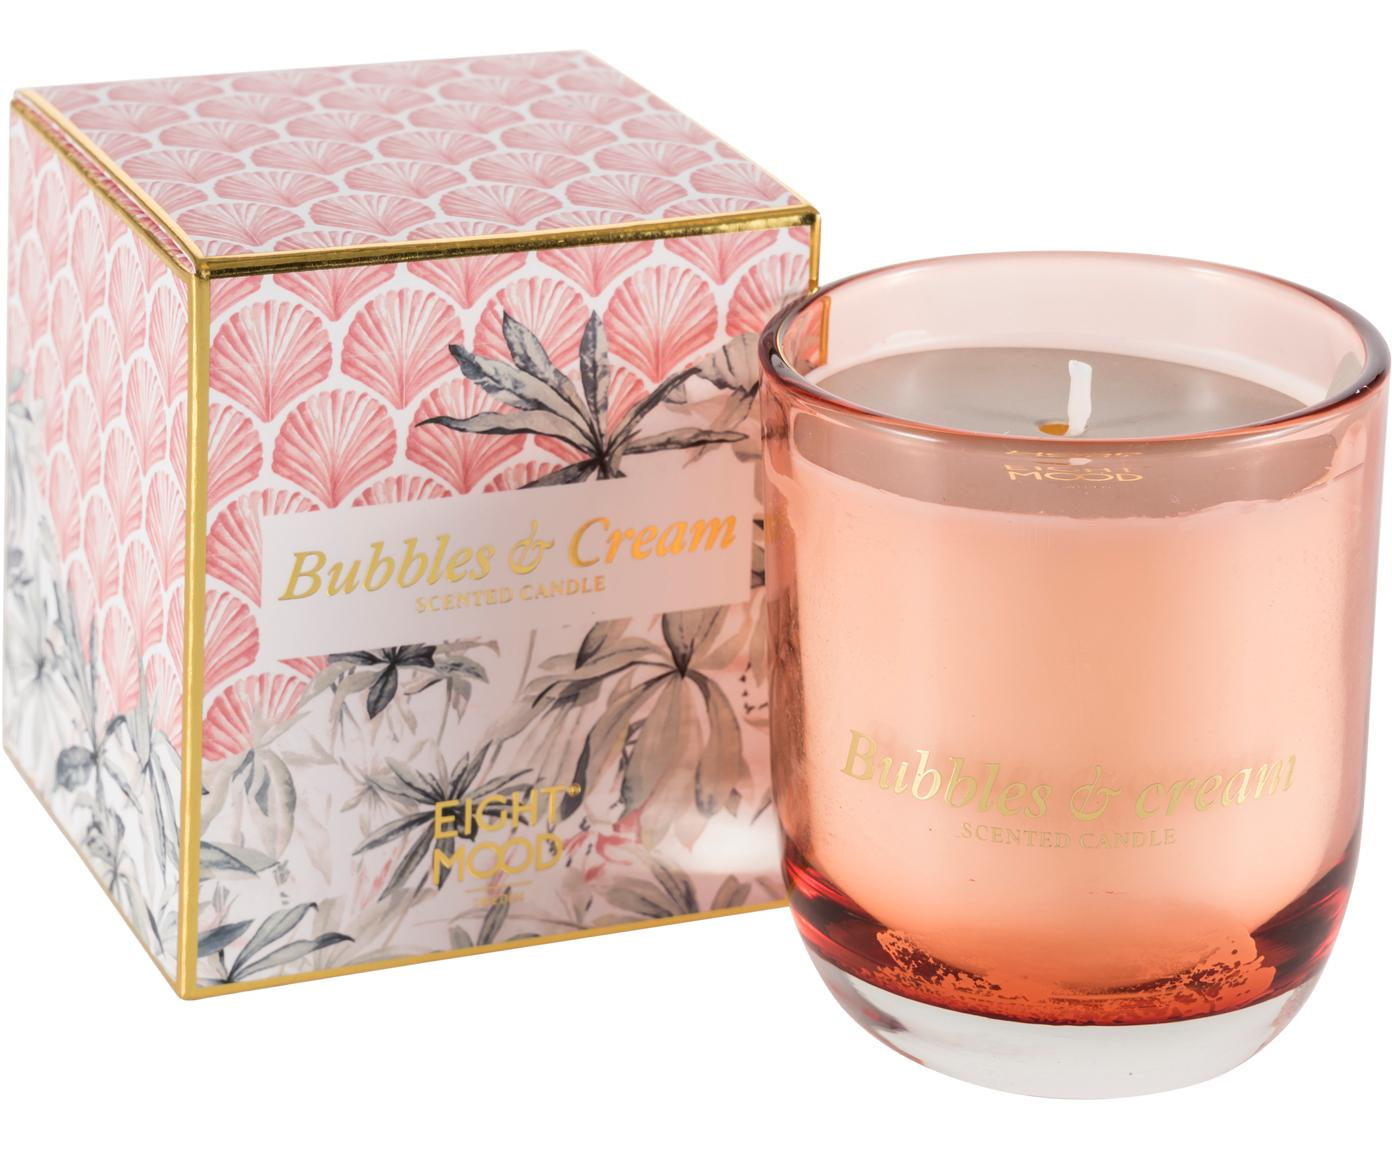 Geurkaars Allure (tuberoos, jasmijn, cederhout), Doos: papier, Houder: glas, Roze, multicolour, 8 x 9 cm